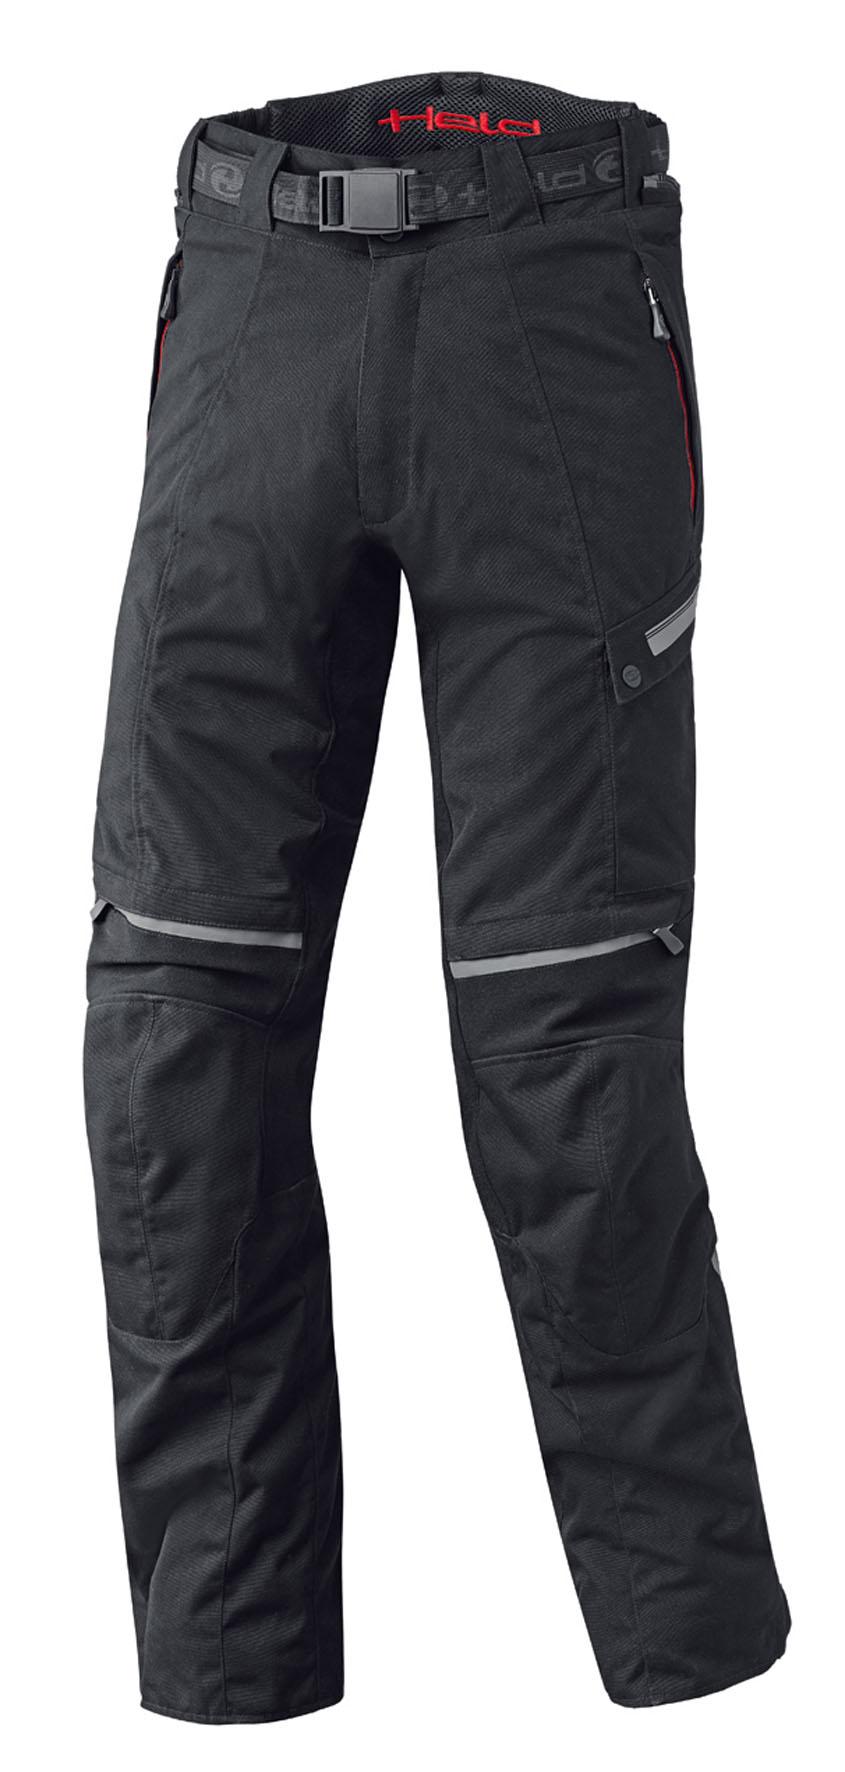 HELD - Pantalonne MURDOCK (Art.6669-Col.01)-01